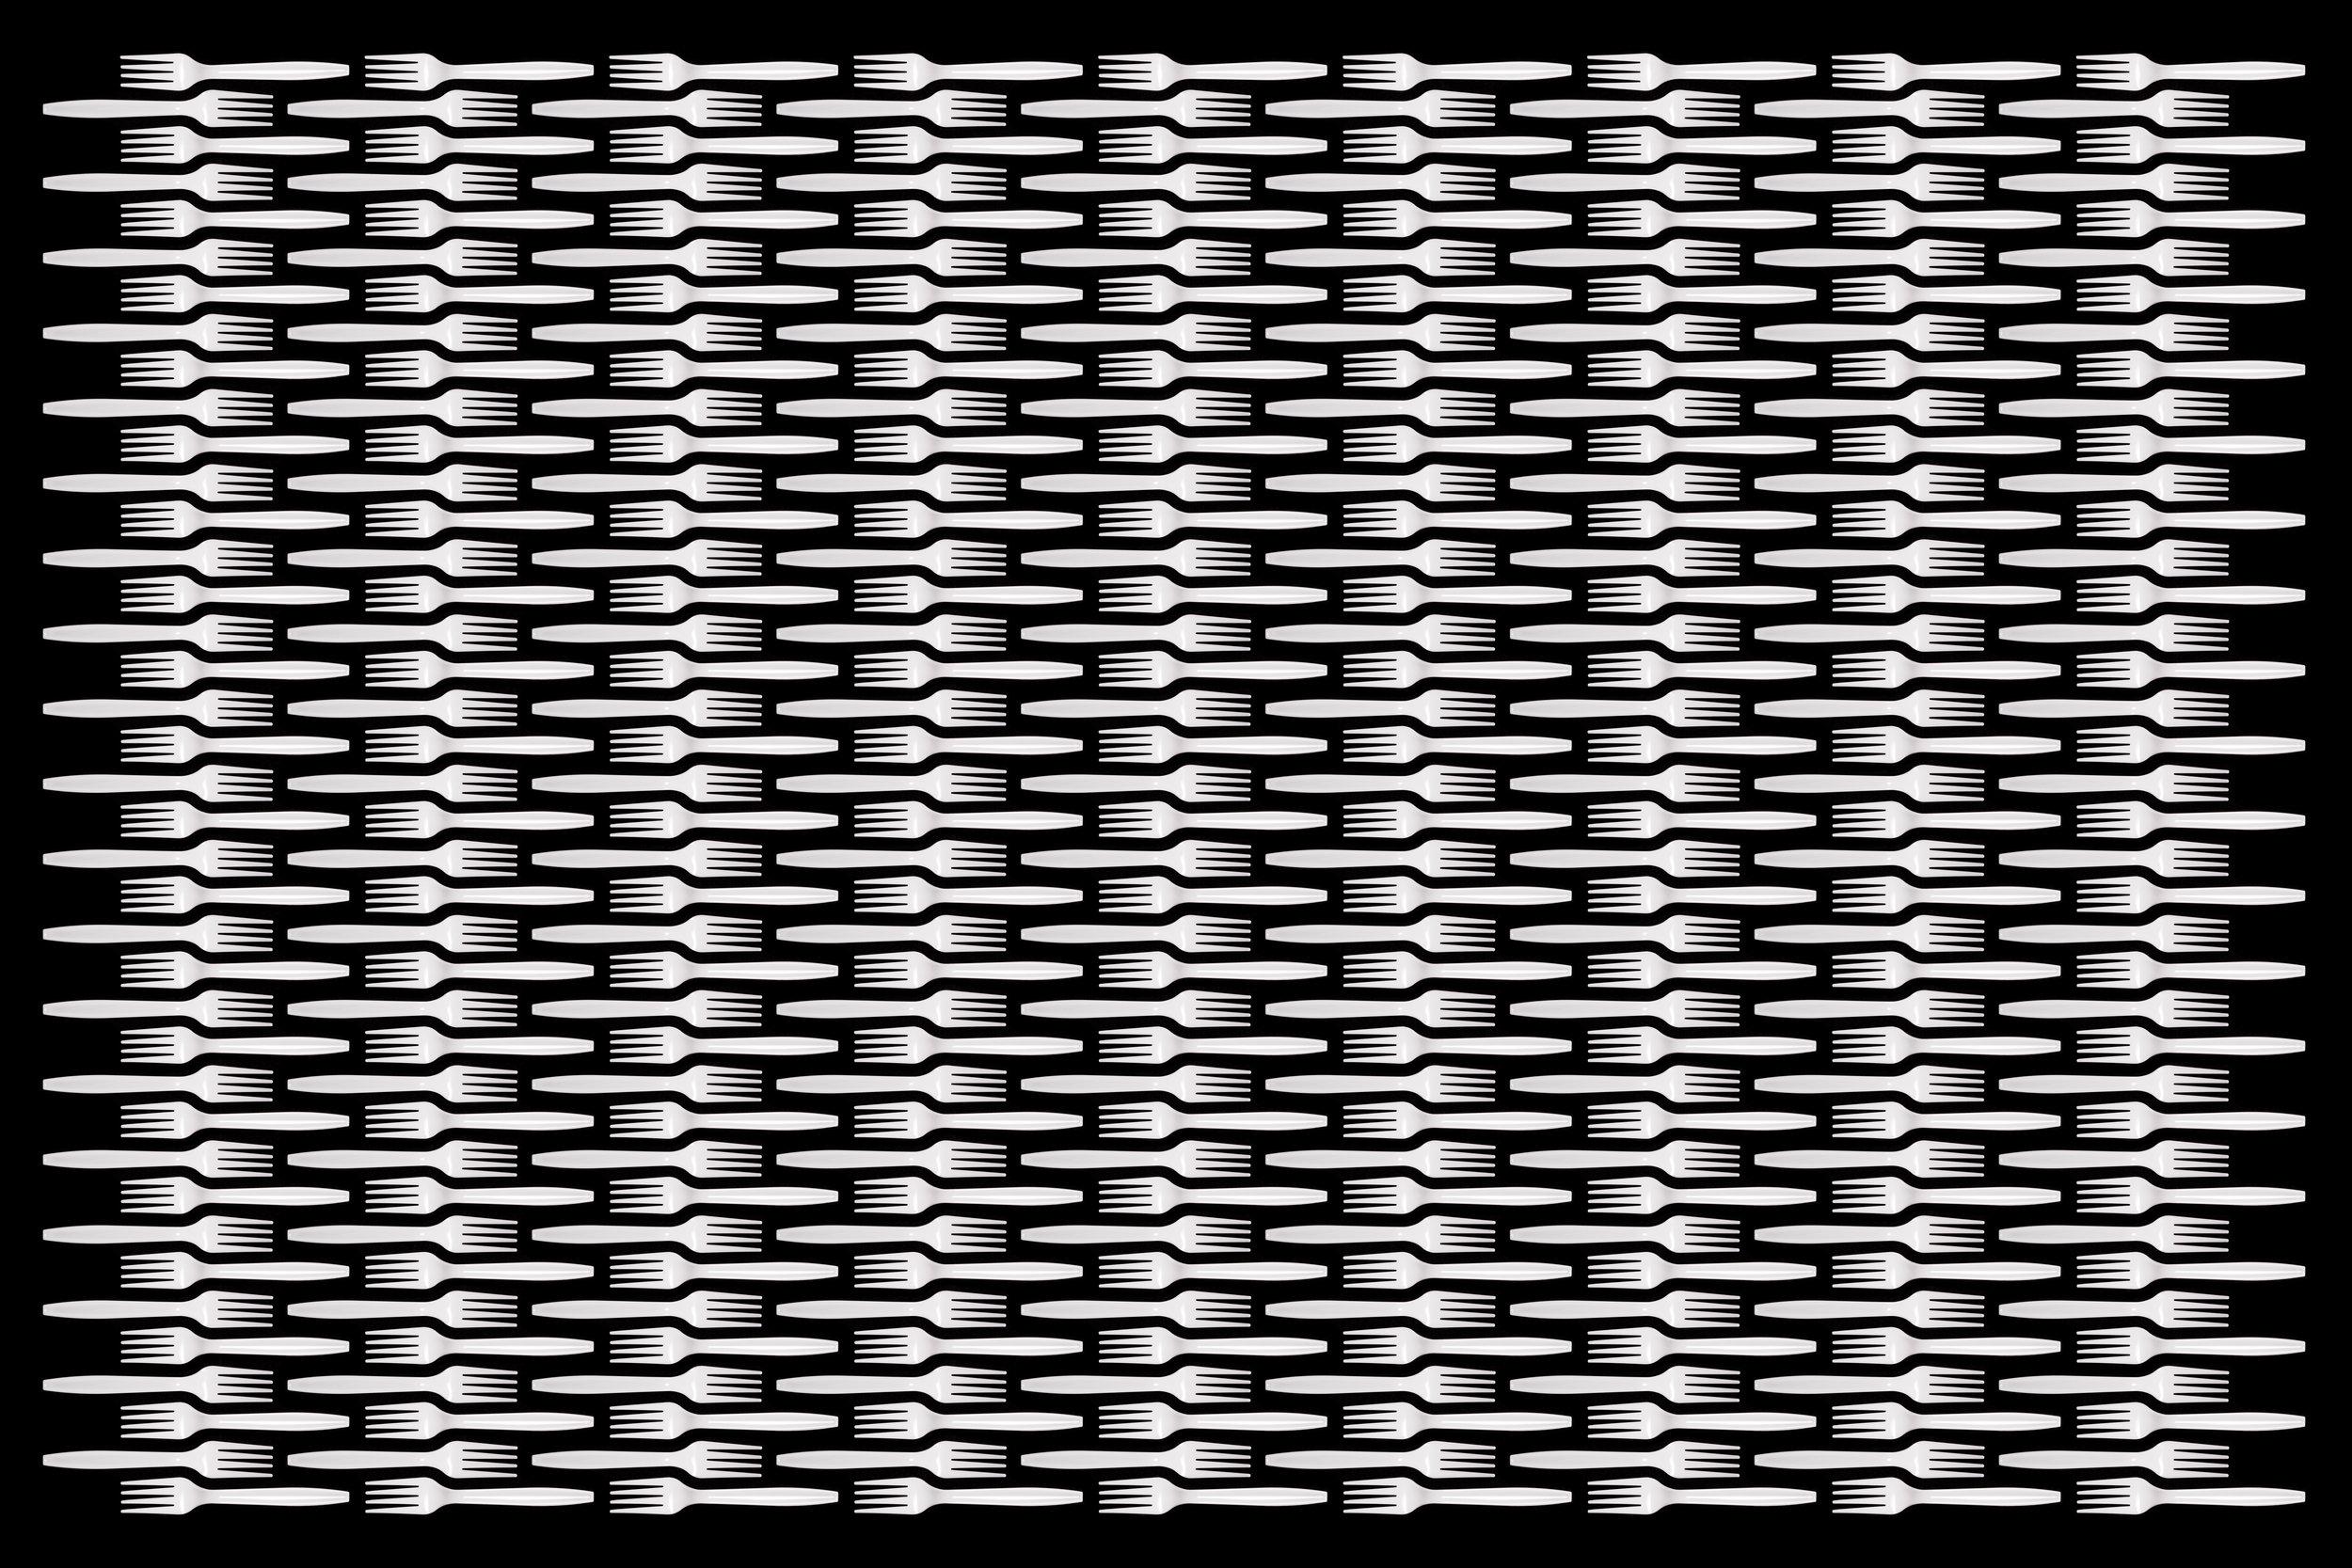 Reproduction_06.jpg